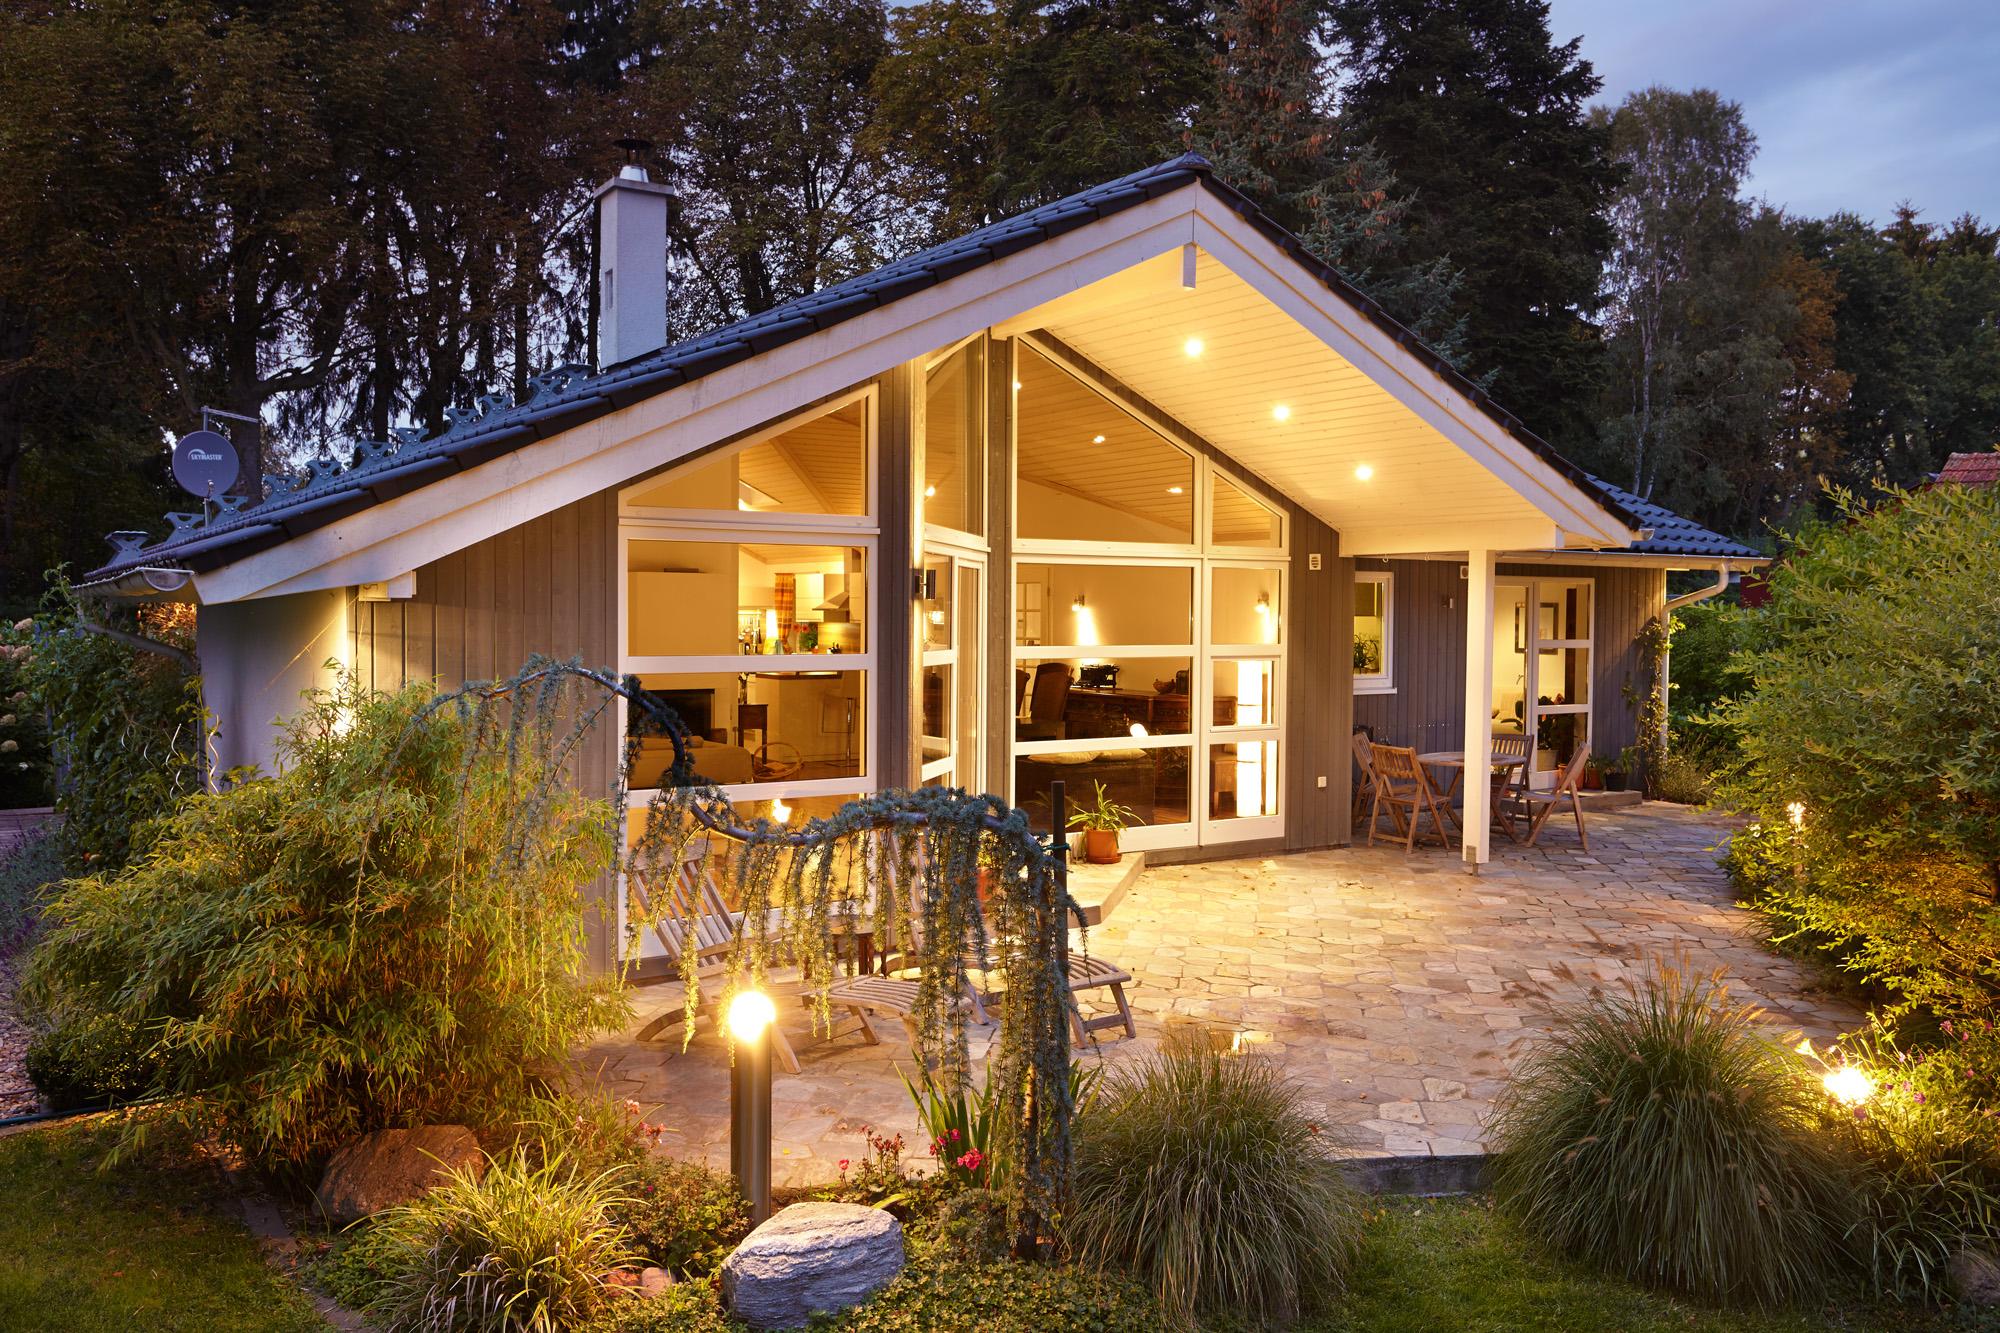 musholm 120 11 ebk haus gmbh. Black Bedroom Furniture Sets. Home Design Ideas